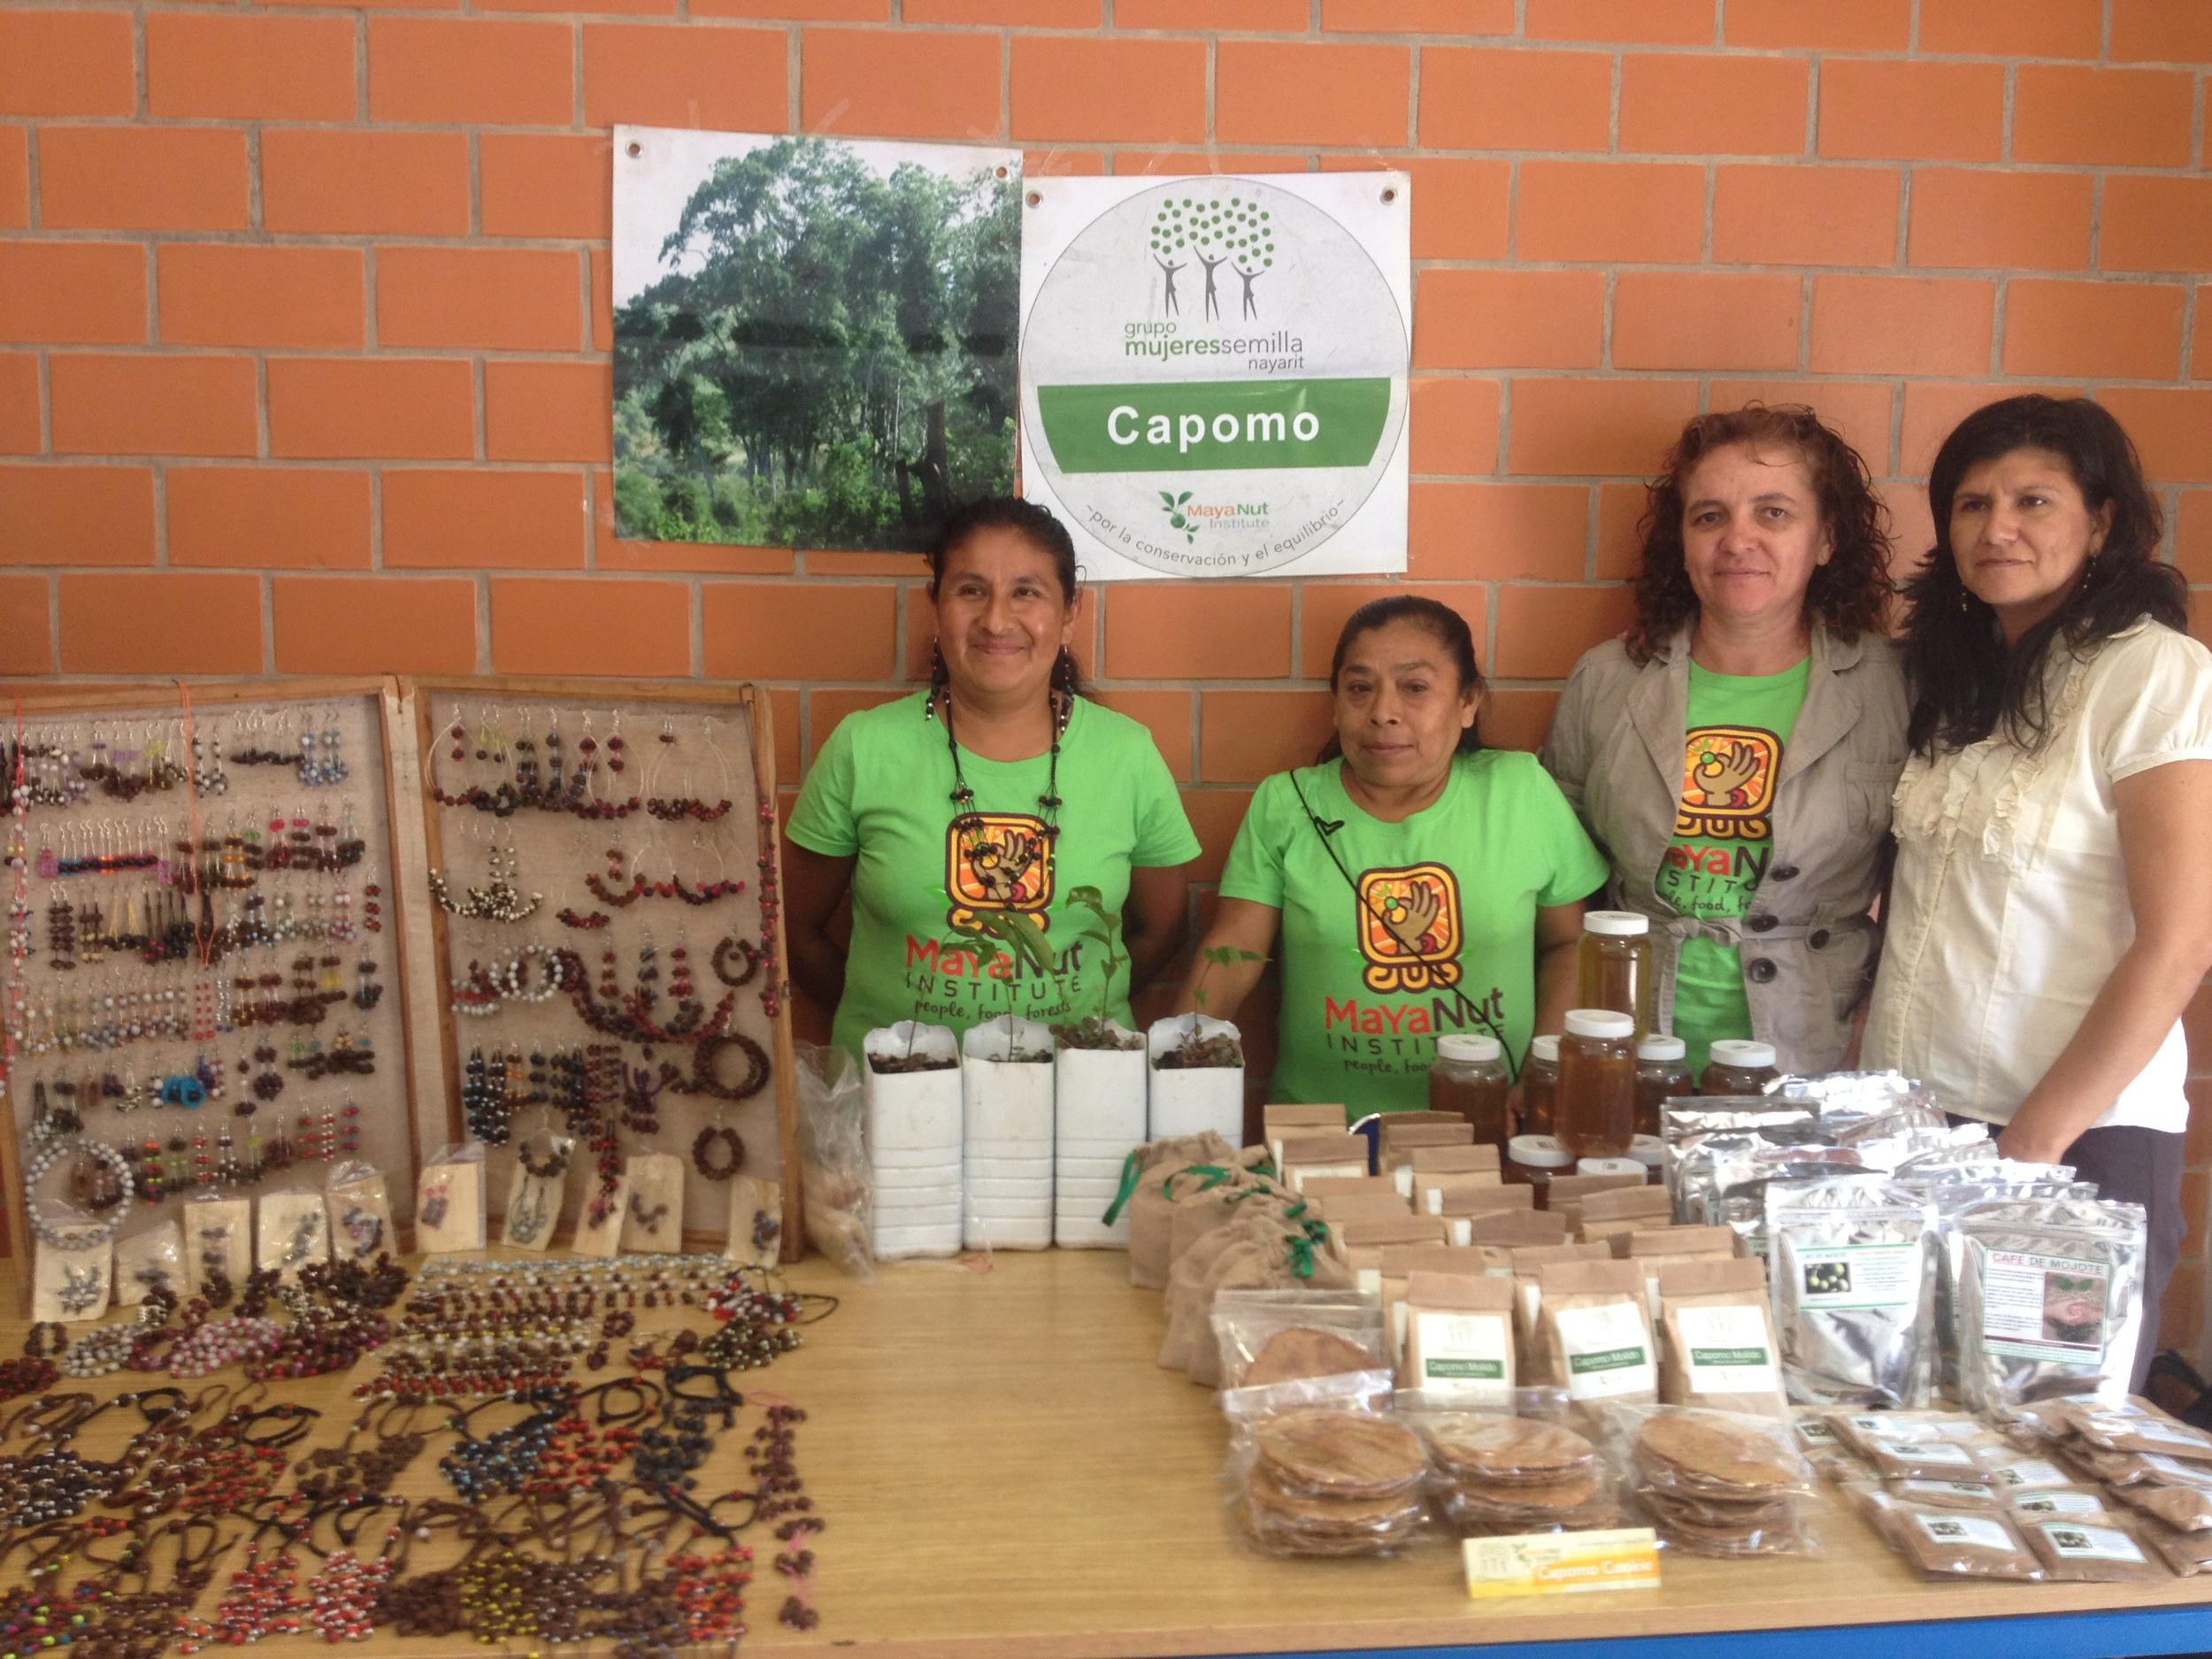 Educators of Capomo (Maya Nut) and reforestation.